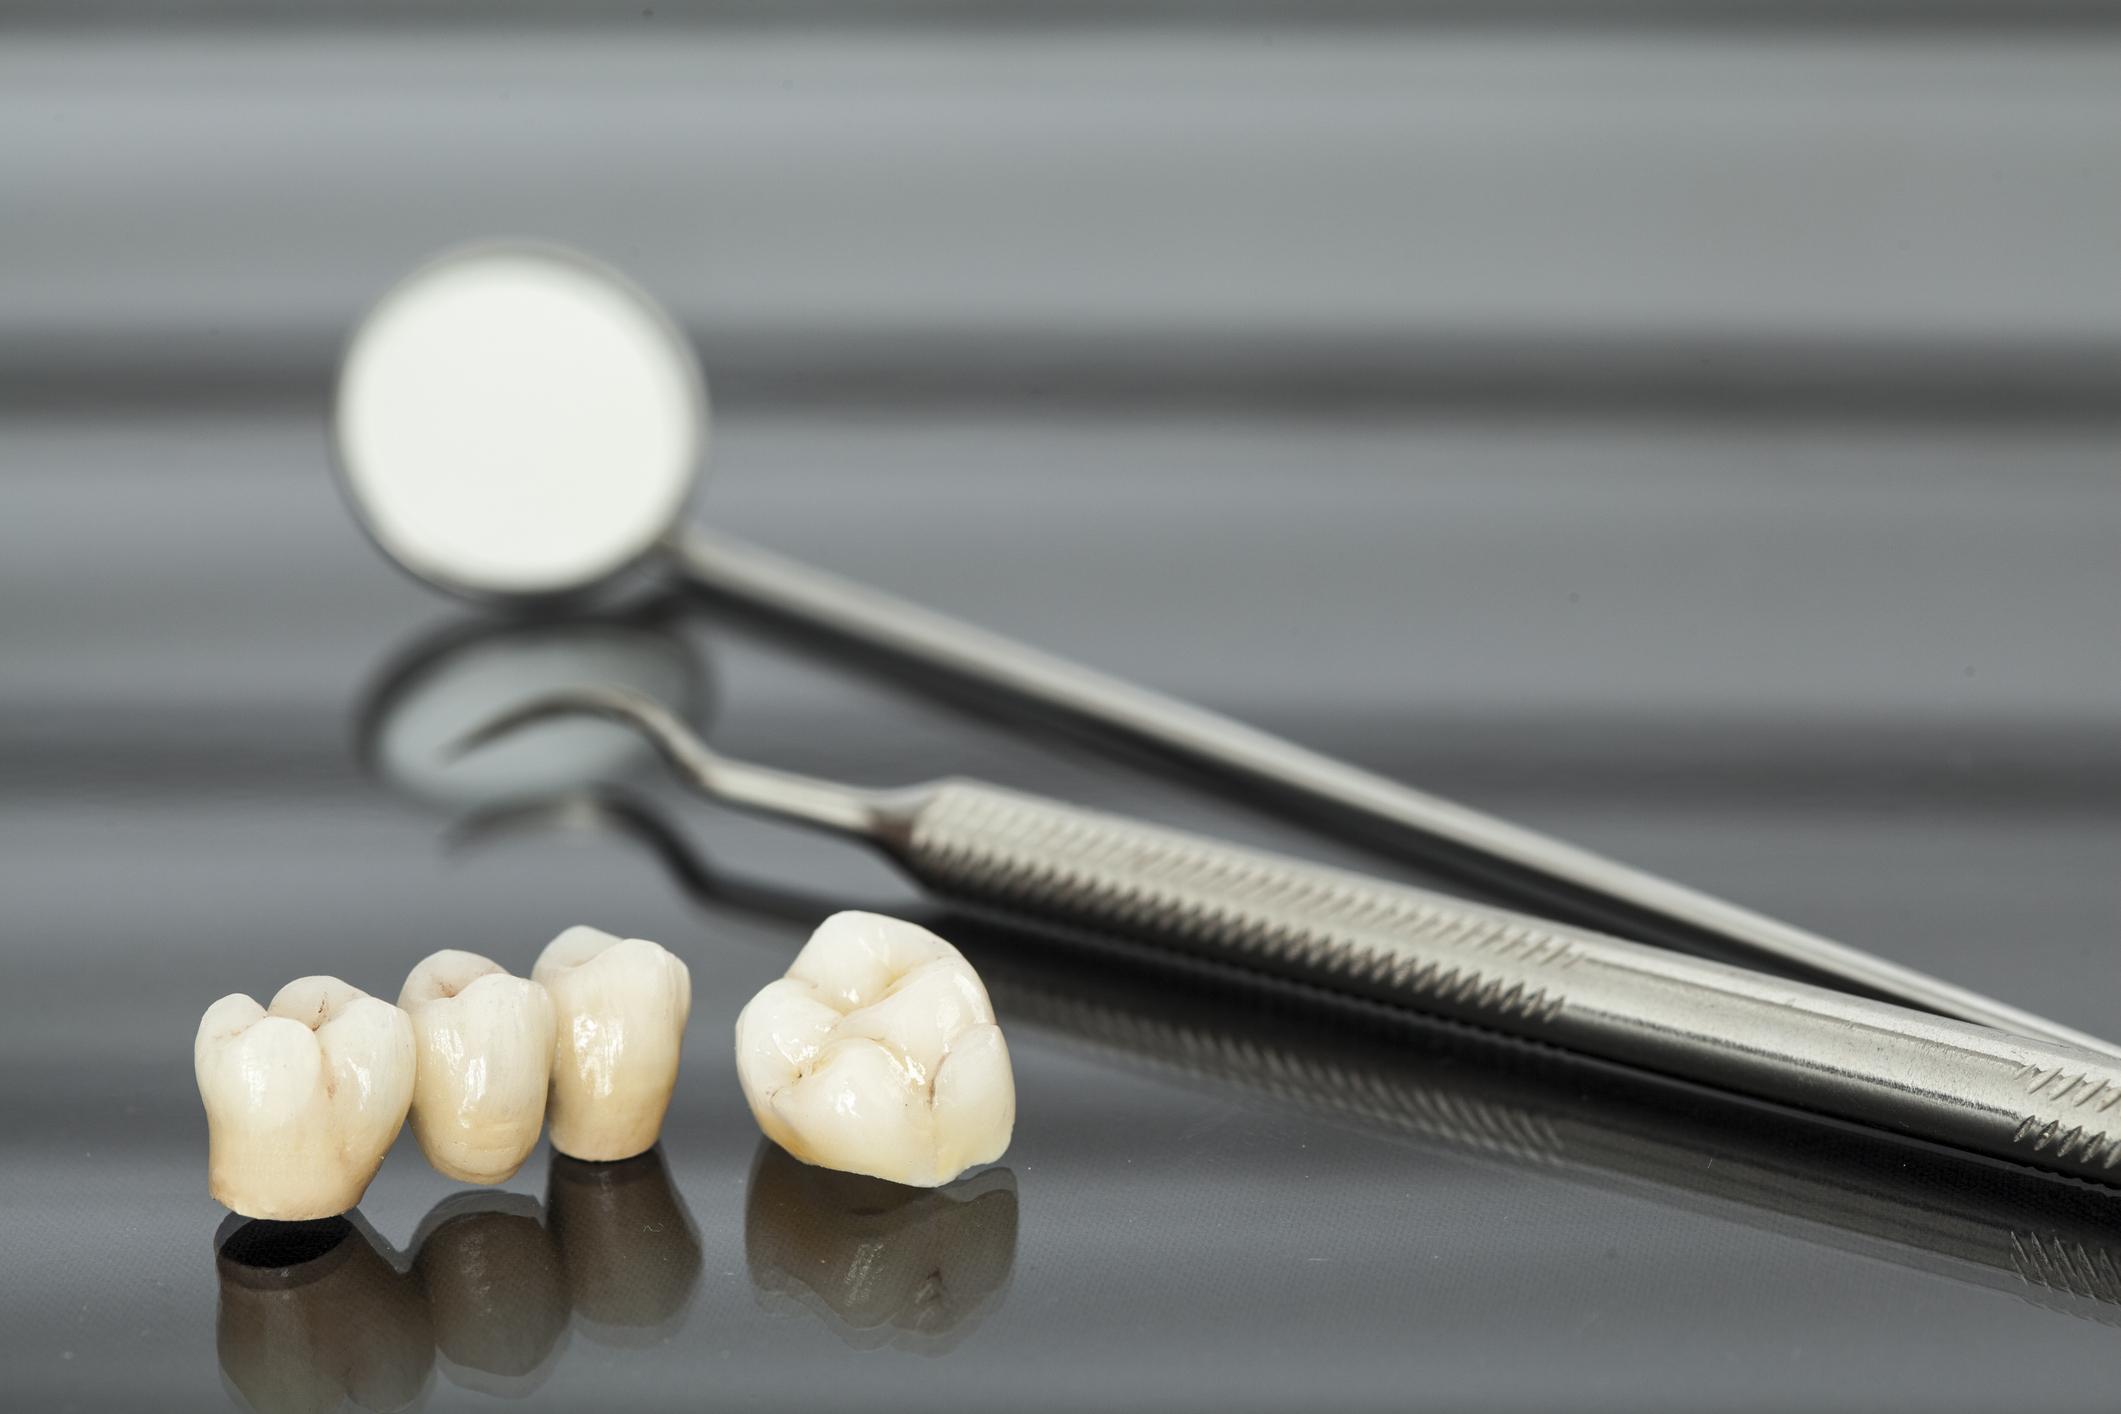 "<a href=""/biomimetic-dentistry"">Biomimetic Dentistry</a>"